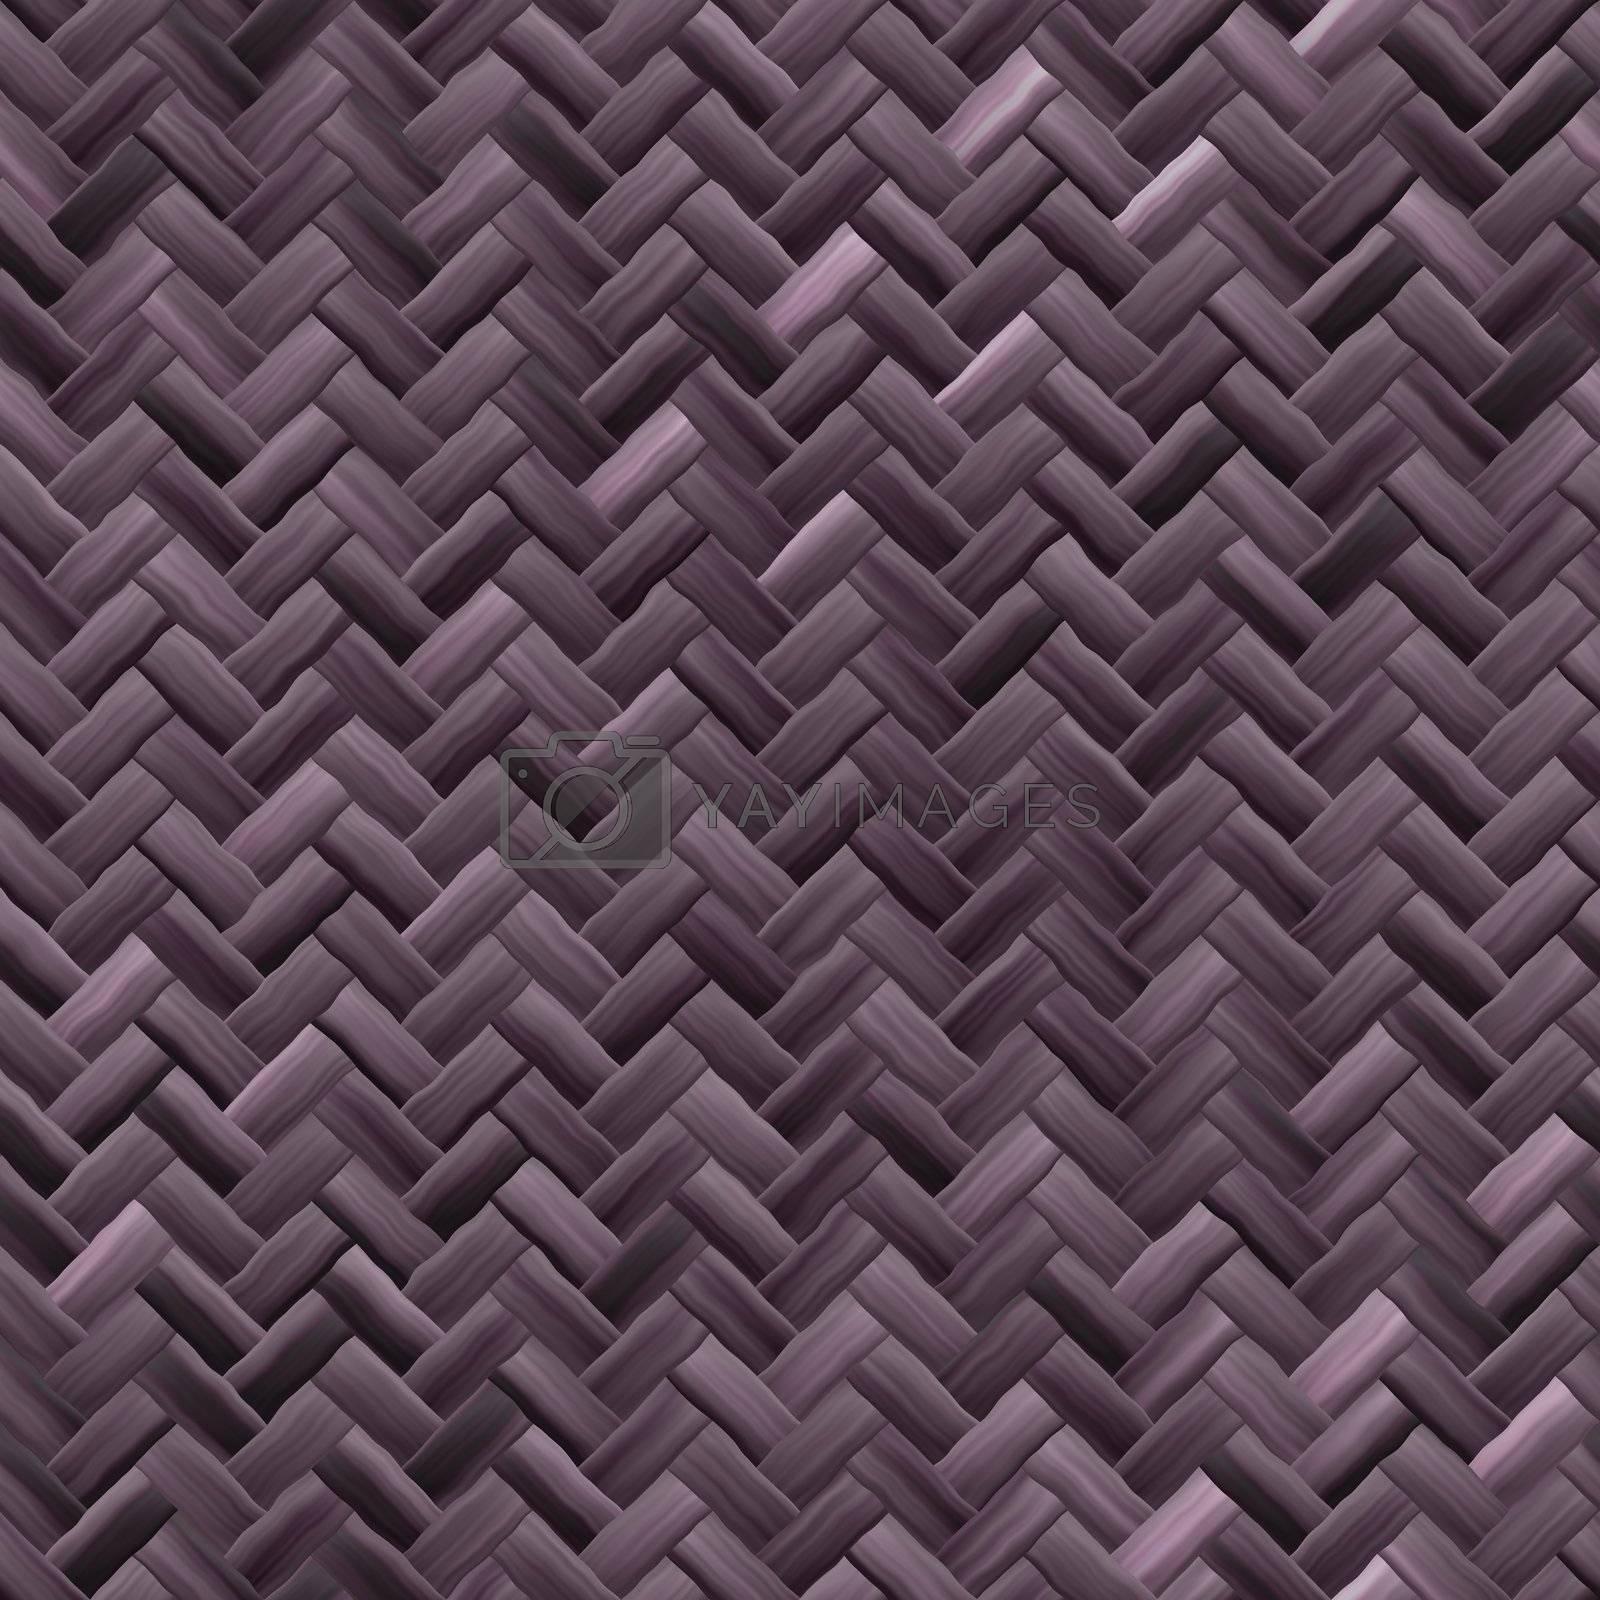 Woven basket texture seamlessly tiling rendered background illustration